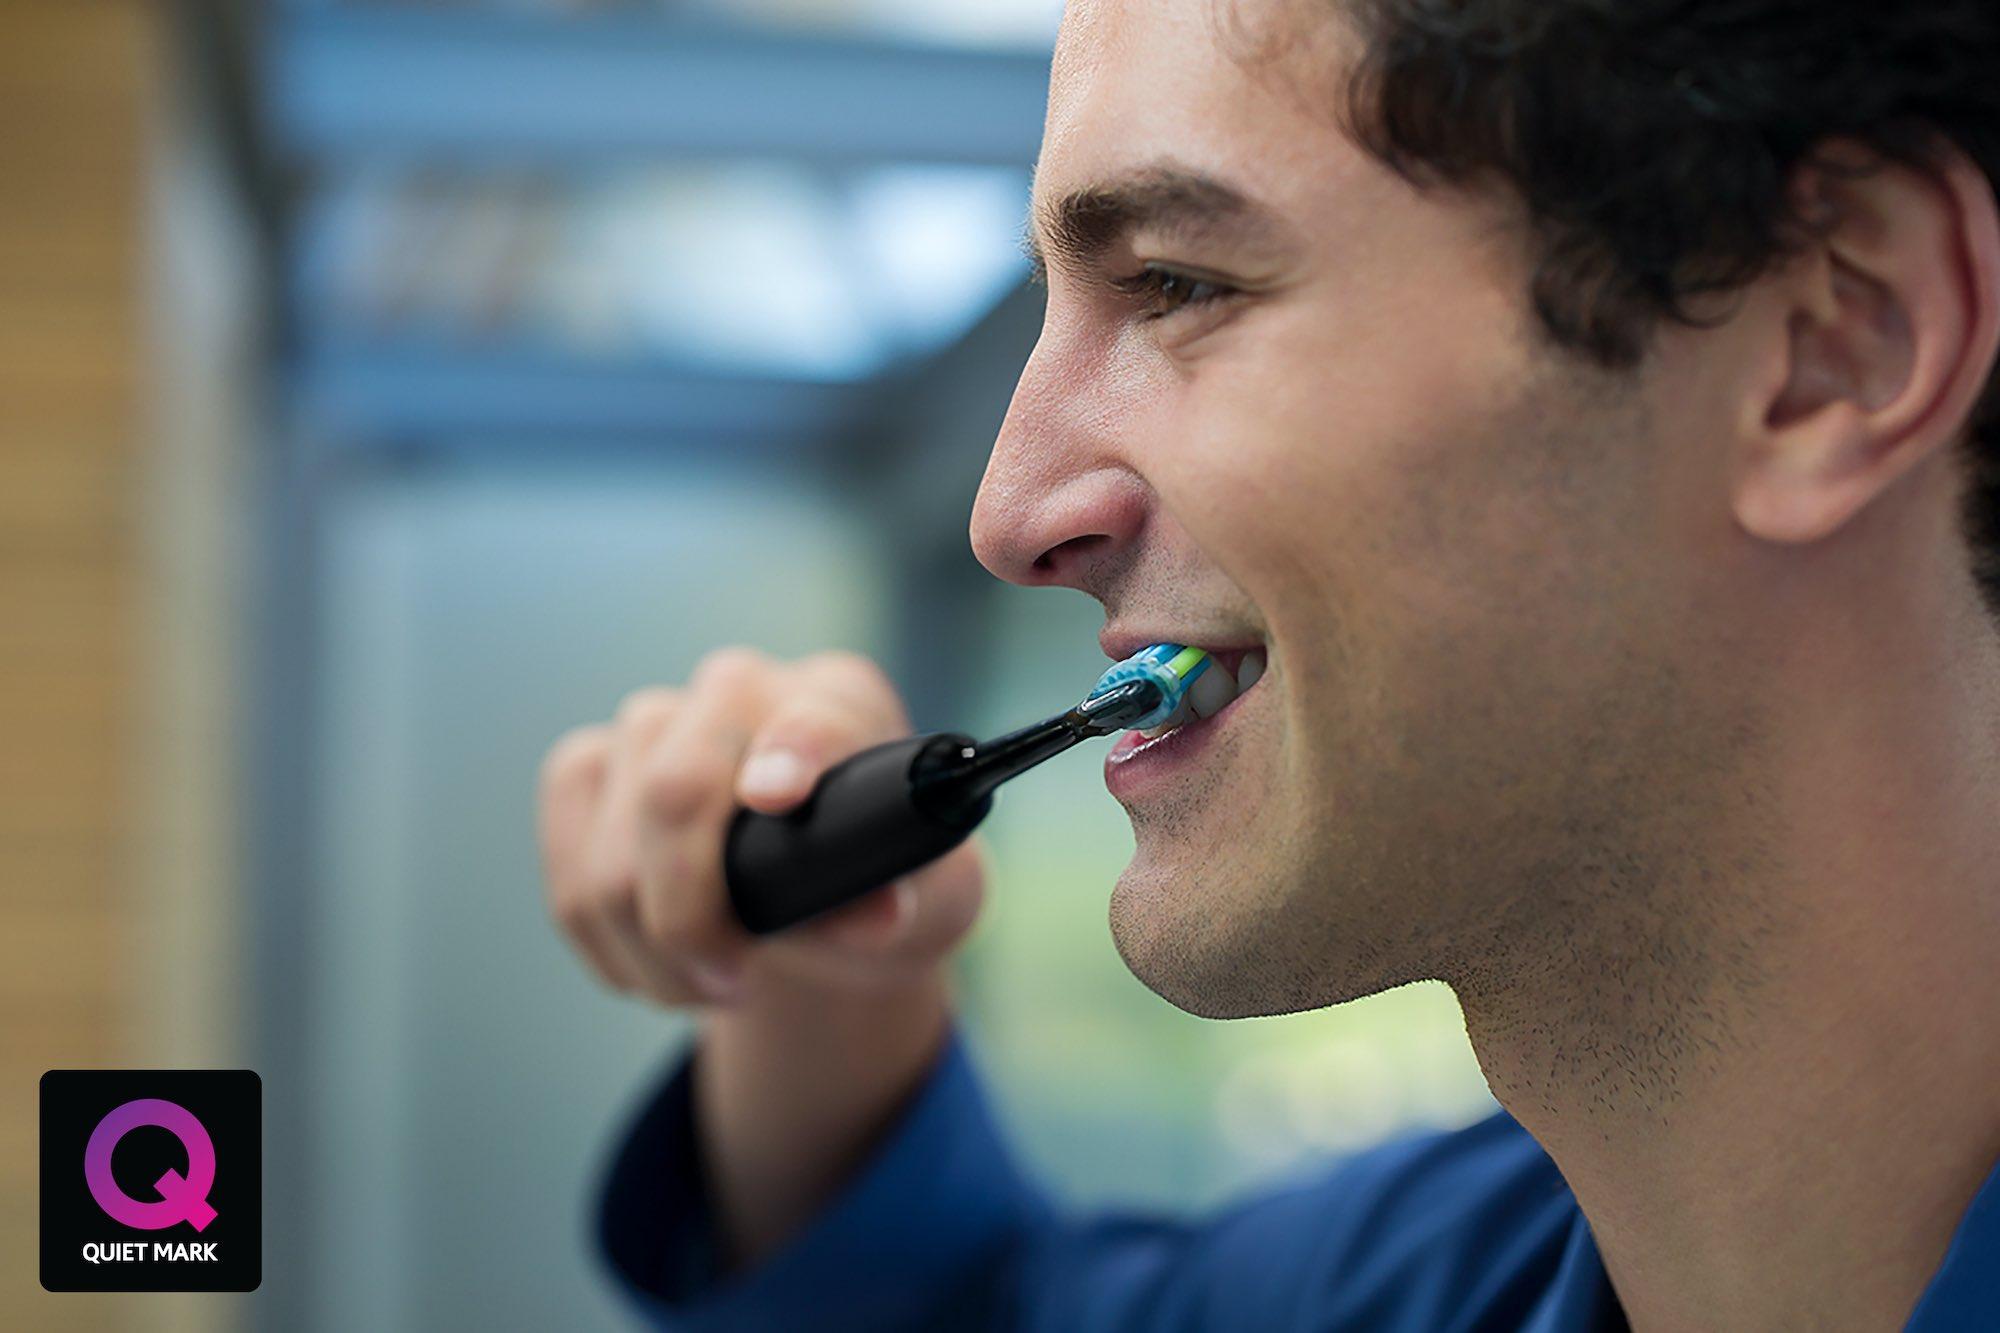 Quiet Mark Philips Sonicare DiamondClean Smart Electric Toothbrush